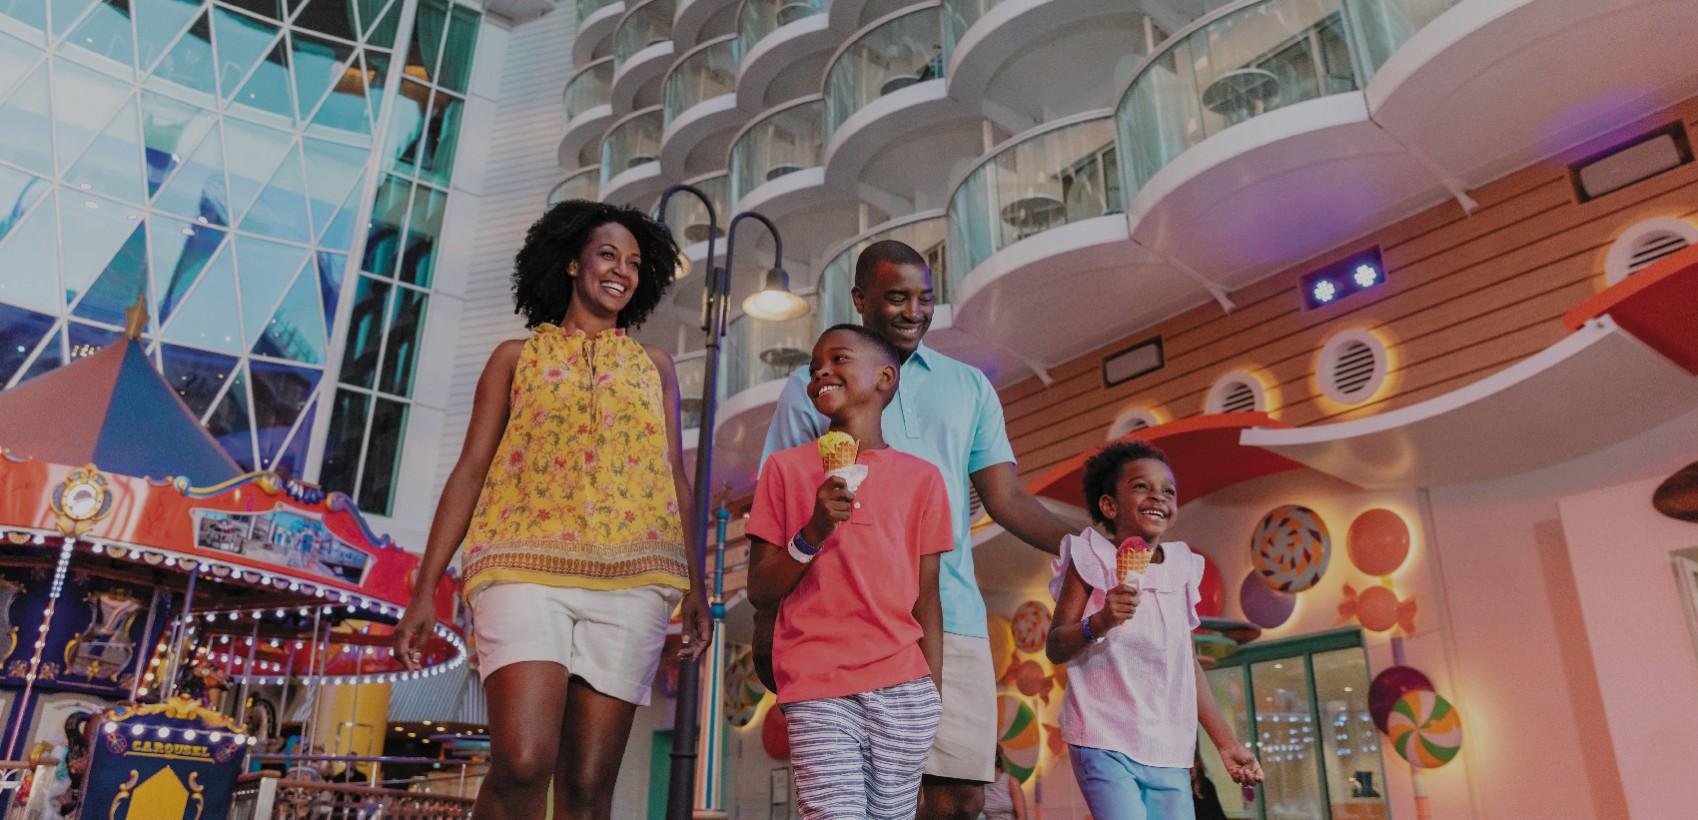 Économisez gros avec Royal Caribbean